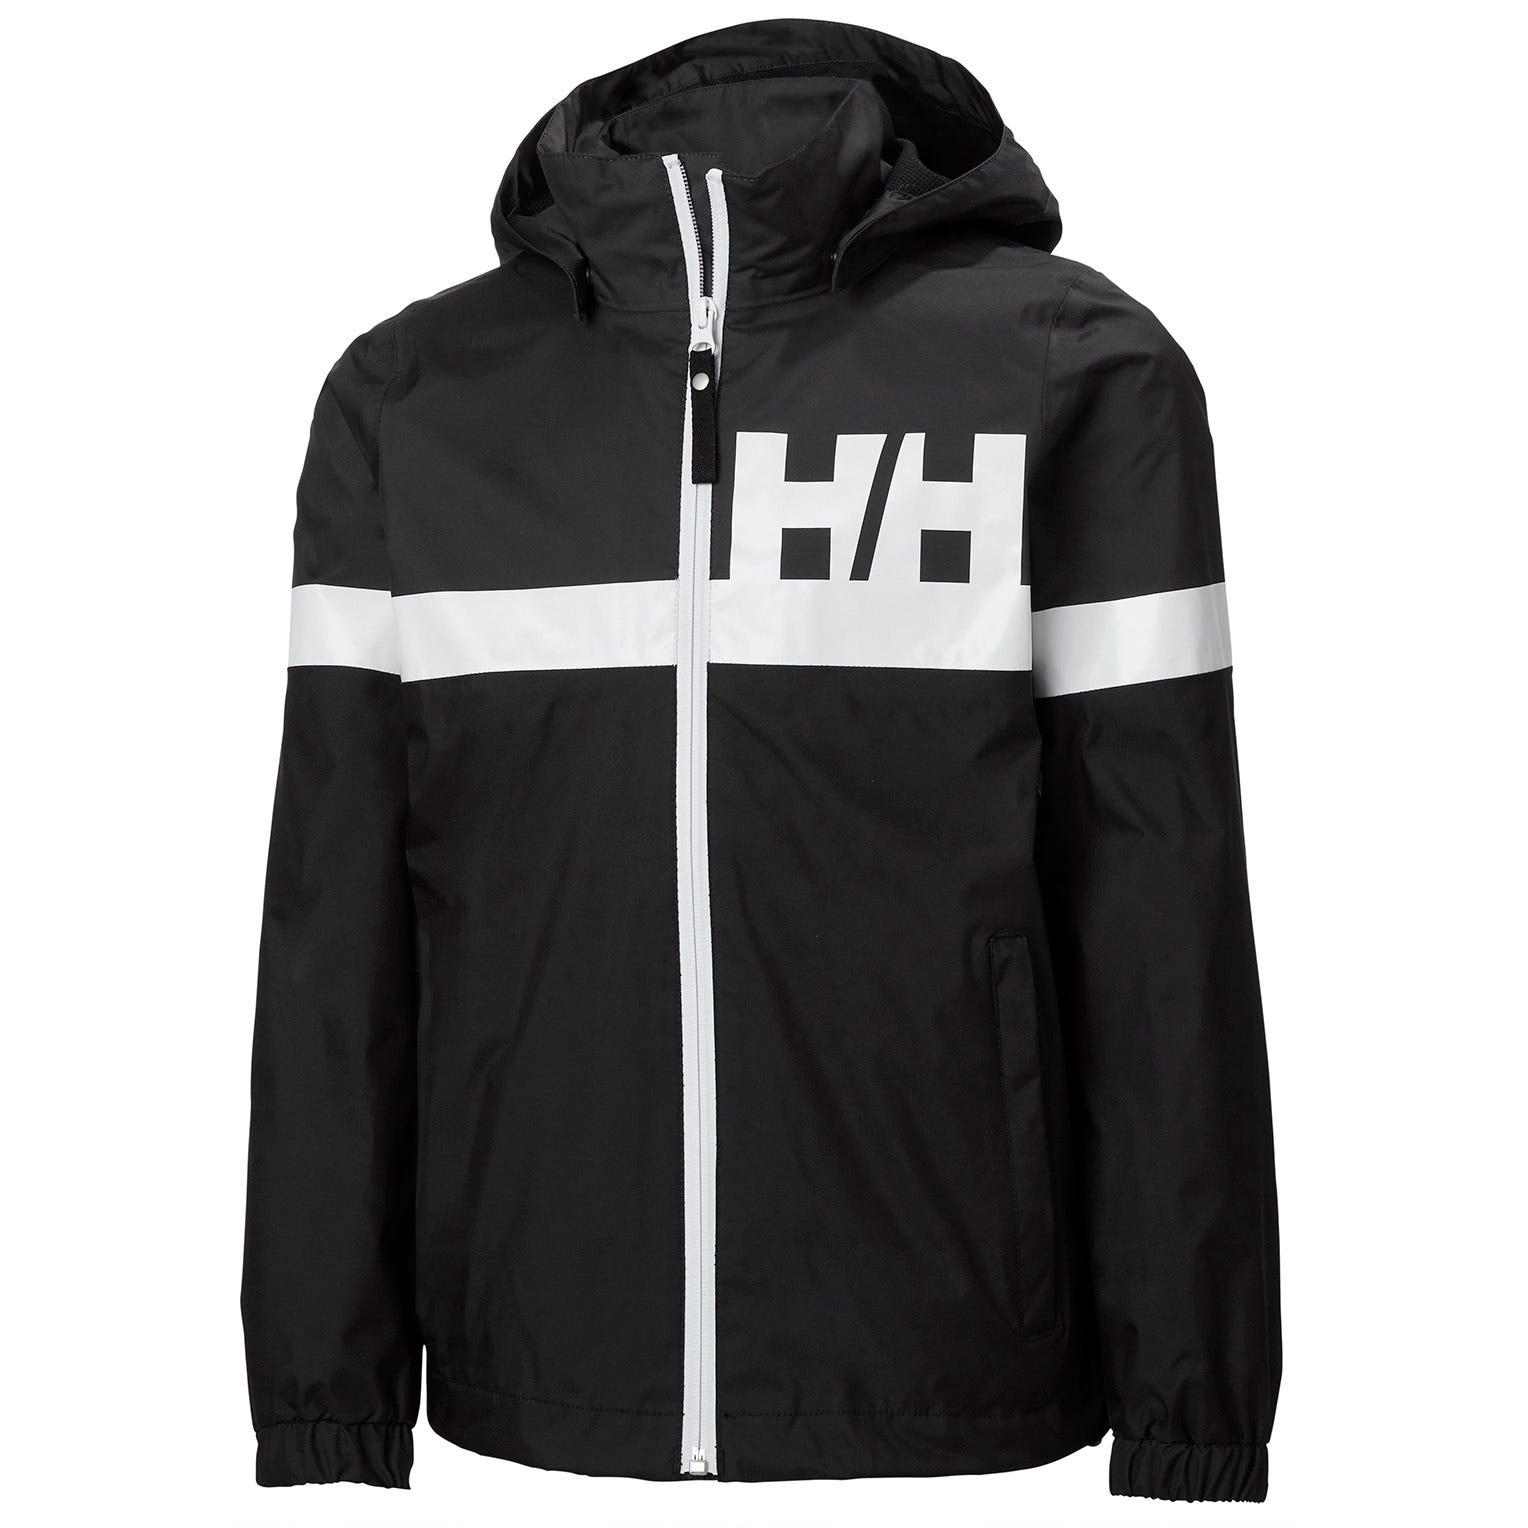 Helly Hansen Juniors Active Classic Quick-dry Rain Jacket Black 140/10